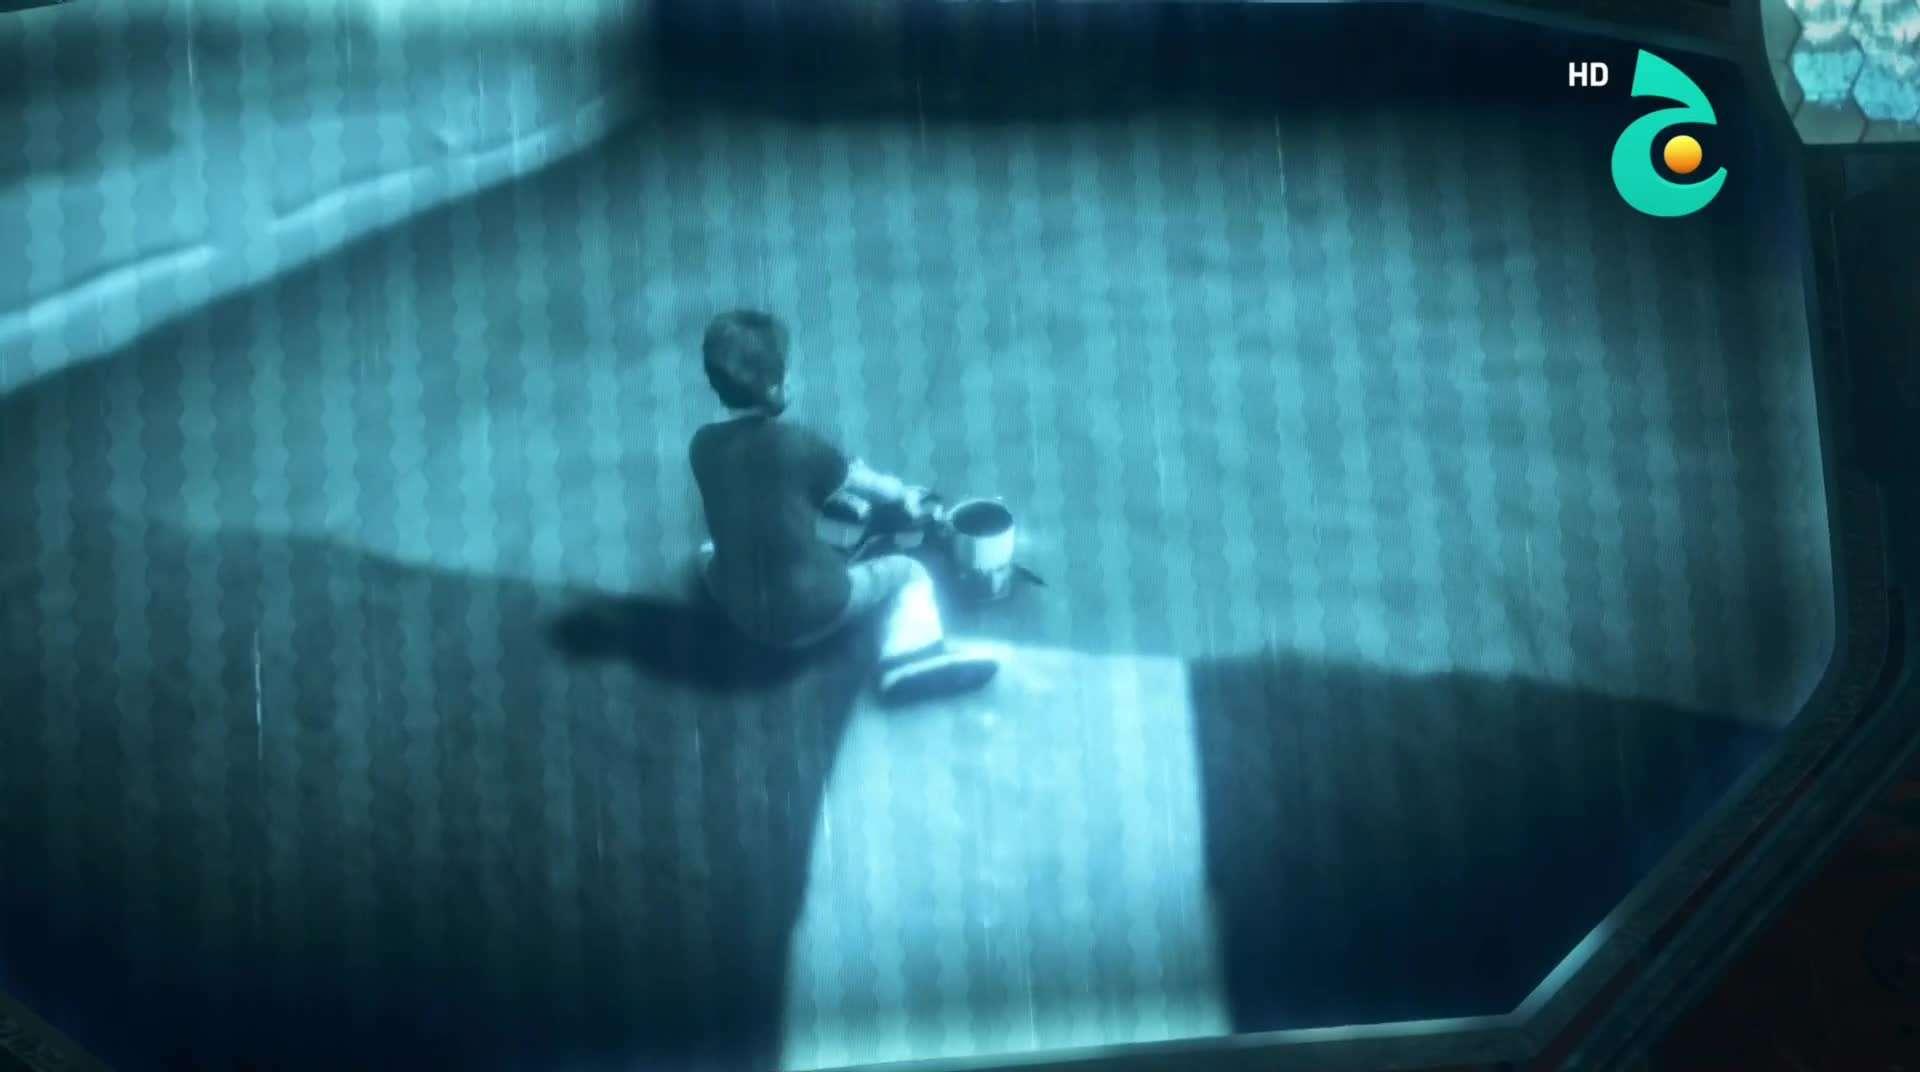 ميلو ورحلة الانقاذ Mars Needs Moms (2011) HDTV 1080p تحميل تورنت 6 arabp2p.com